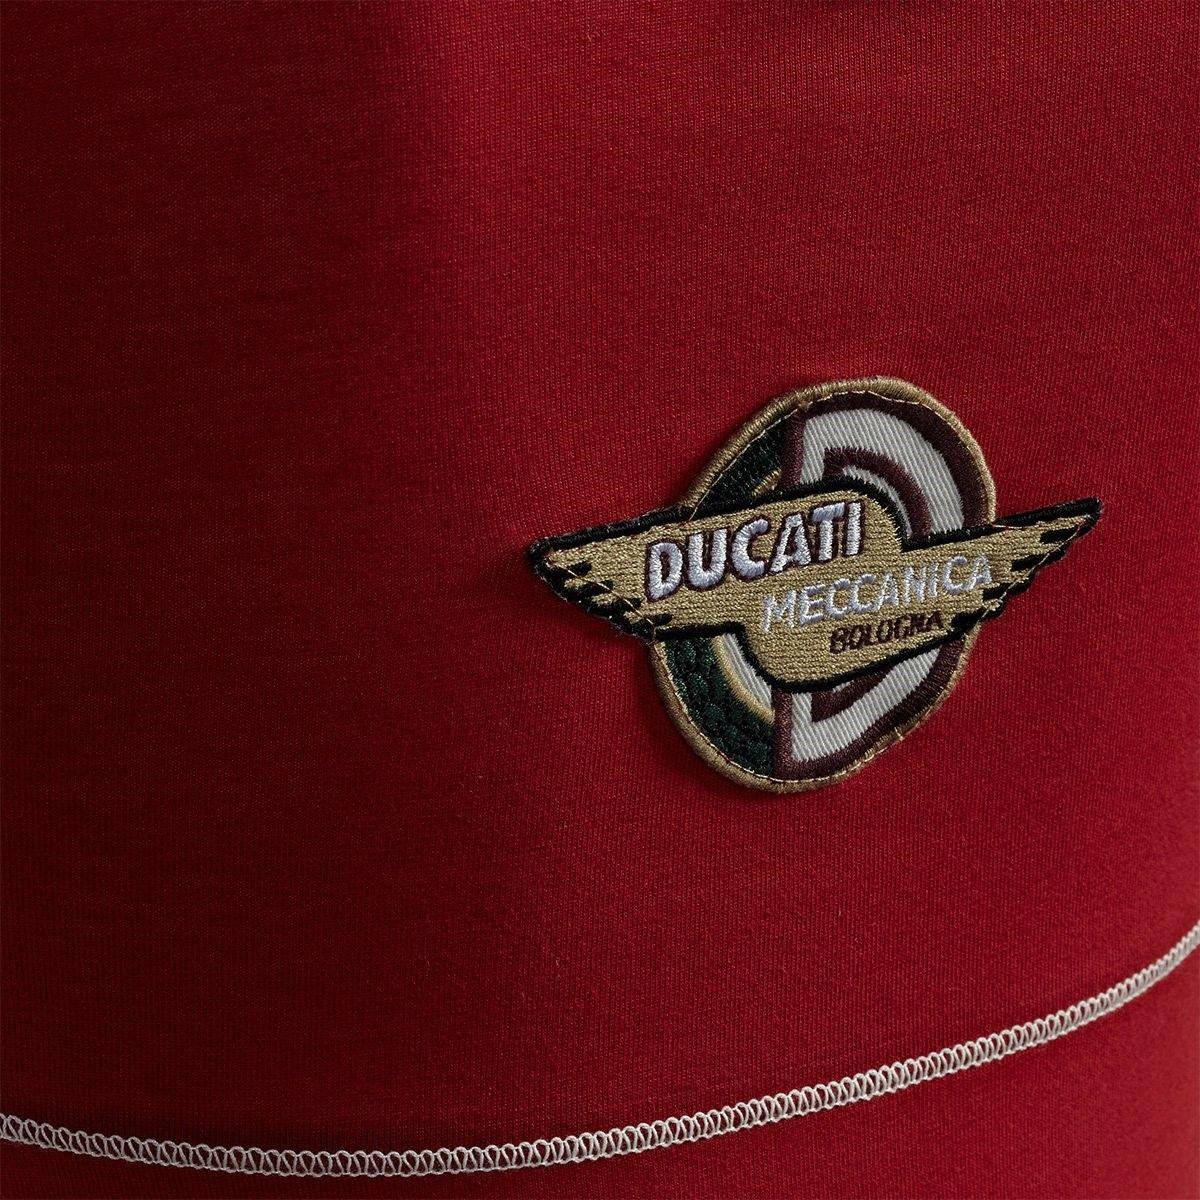 【DUCATI performance】Meccanica 女用背心 - 「Webike-摩托百貨」